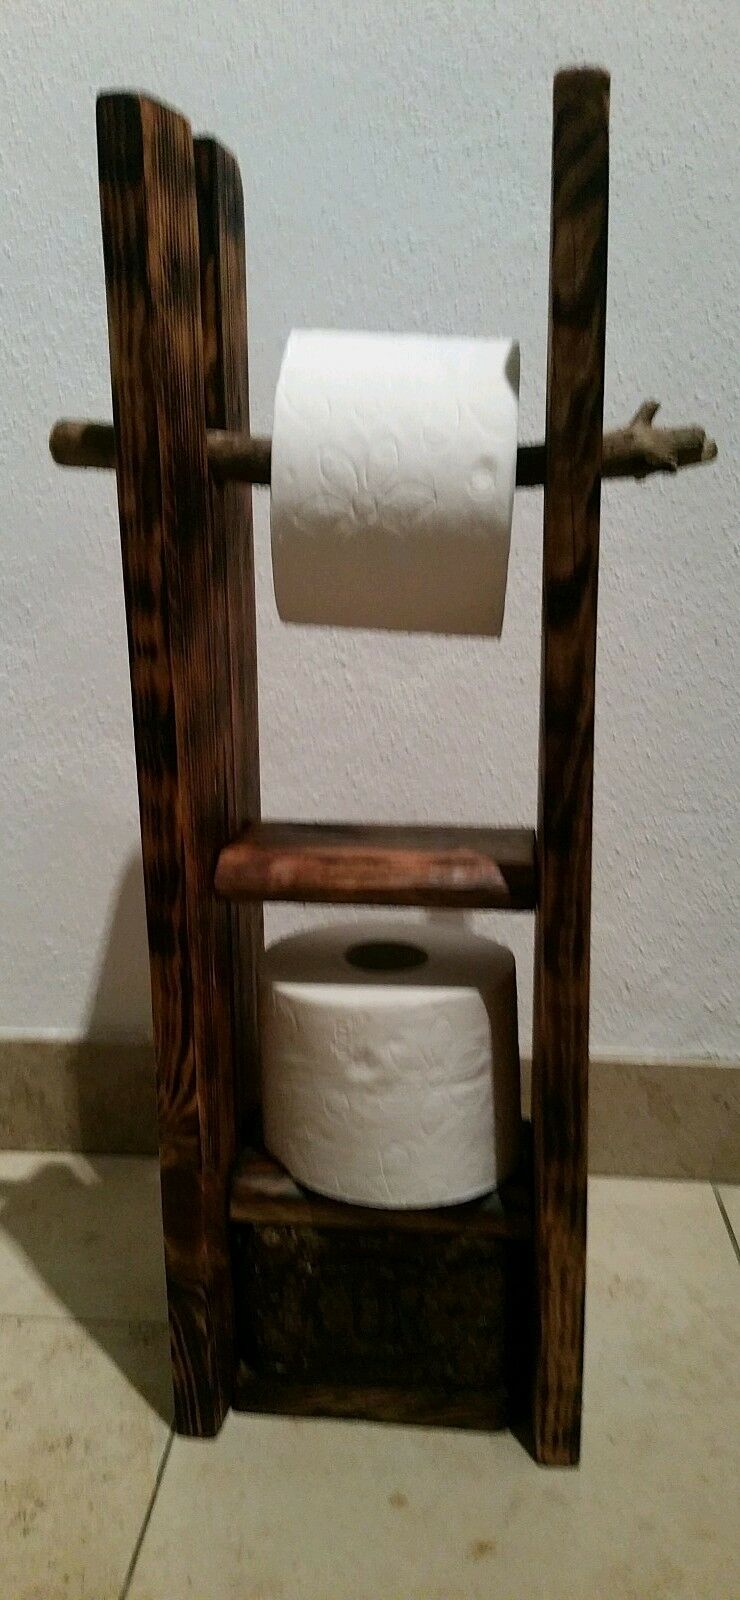 Holz Toilettenpapierhalter KlGoldllenhalter WC WC WC Rolle Pallettenmöbel 0049c9